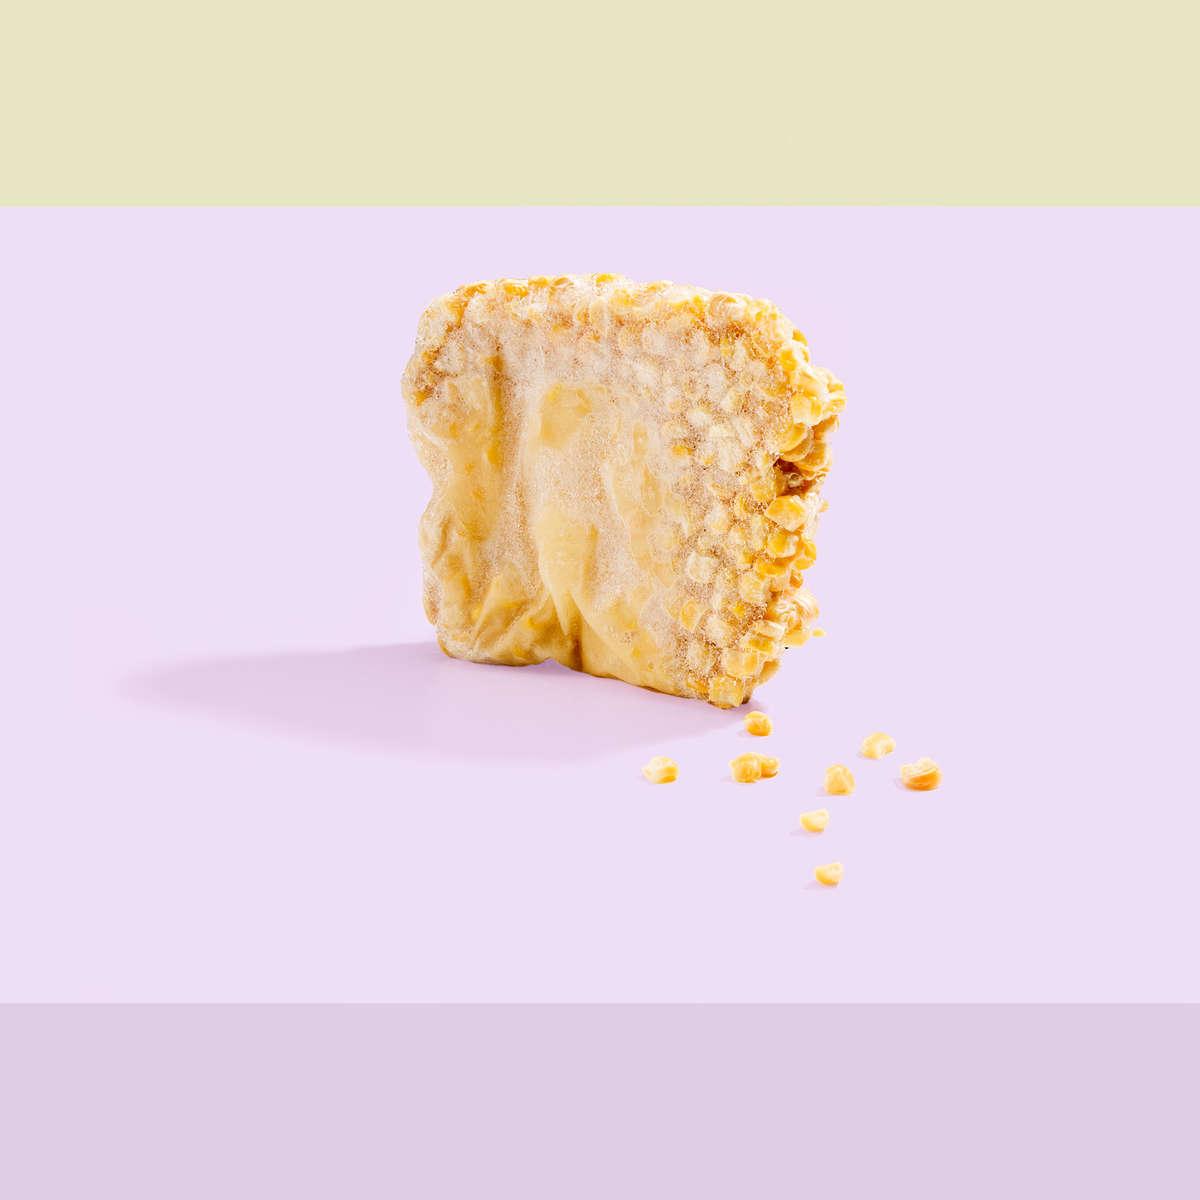 A photograph of frozen block of corn